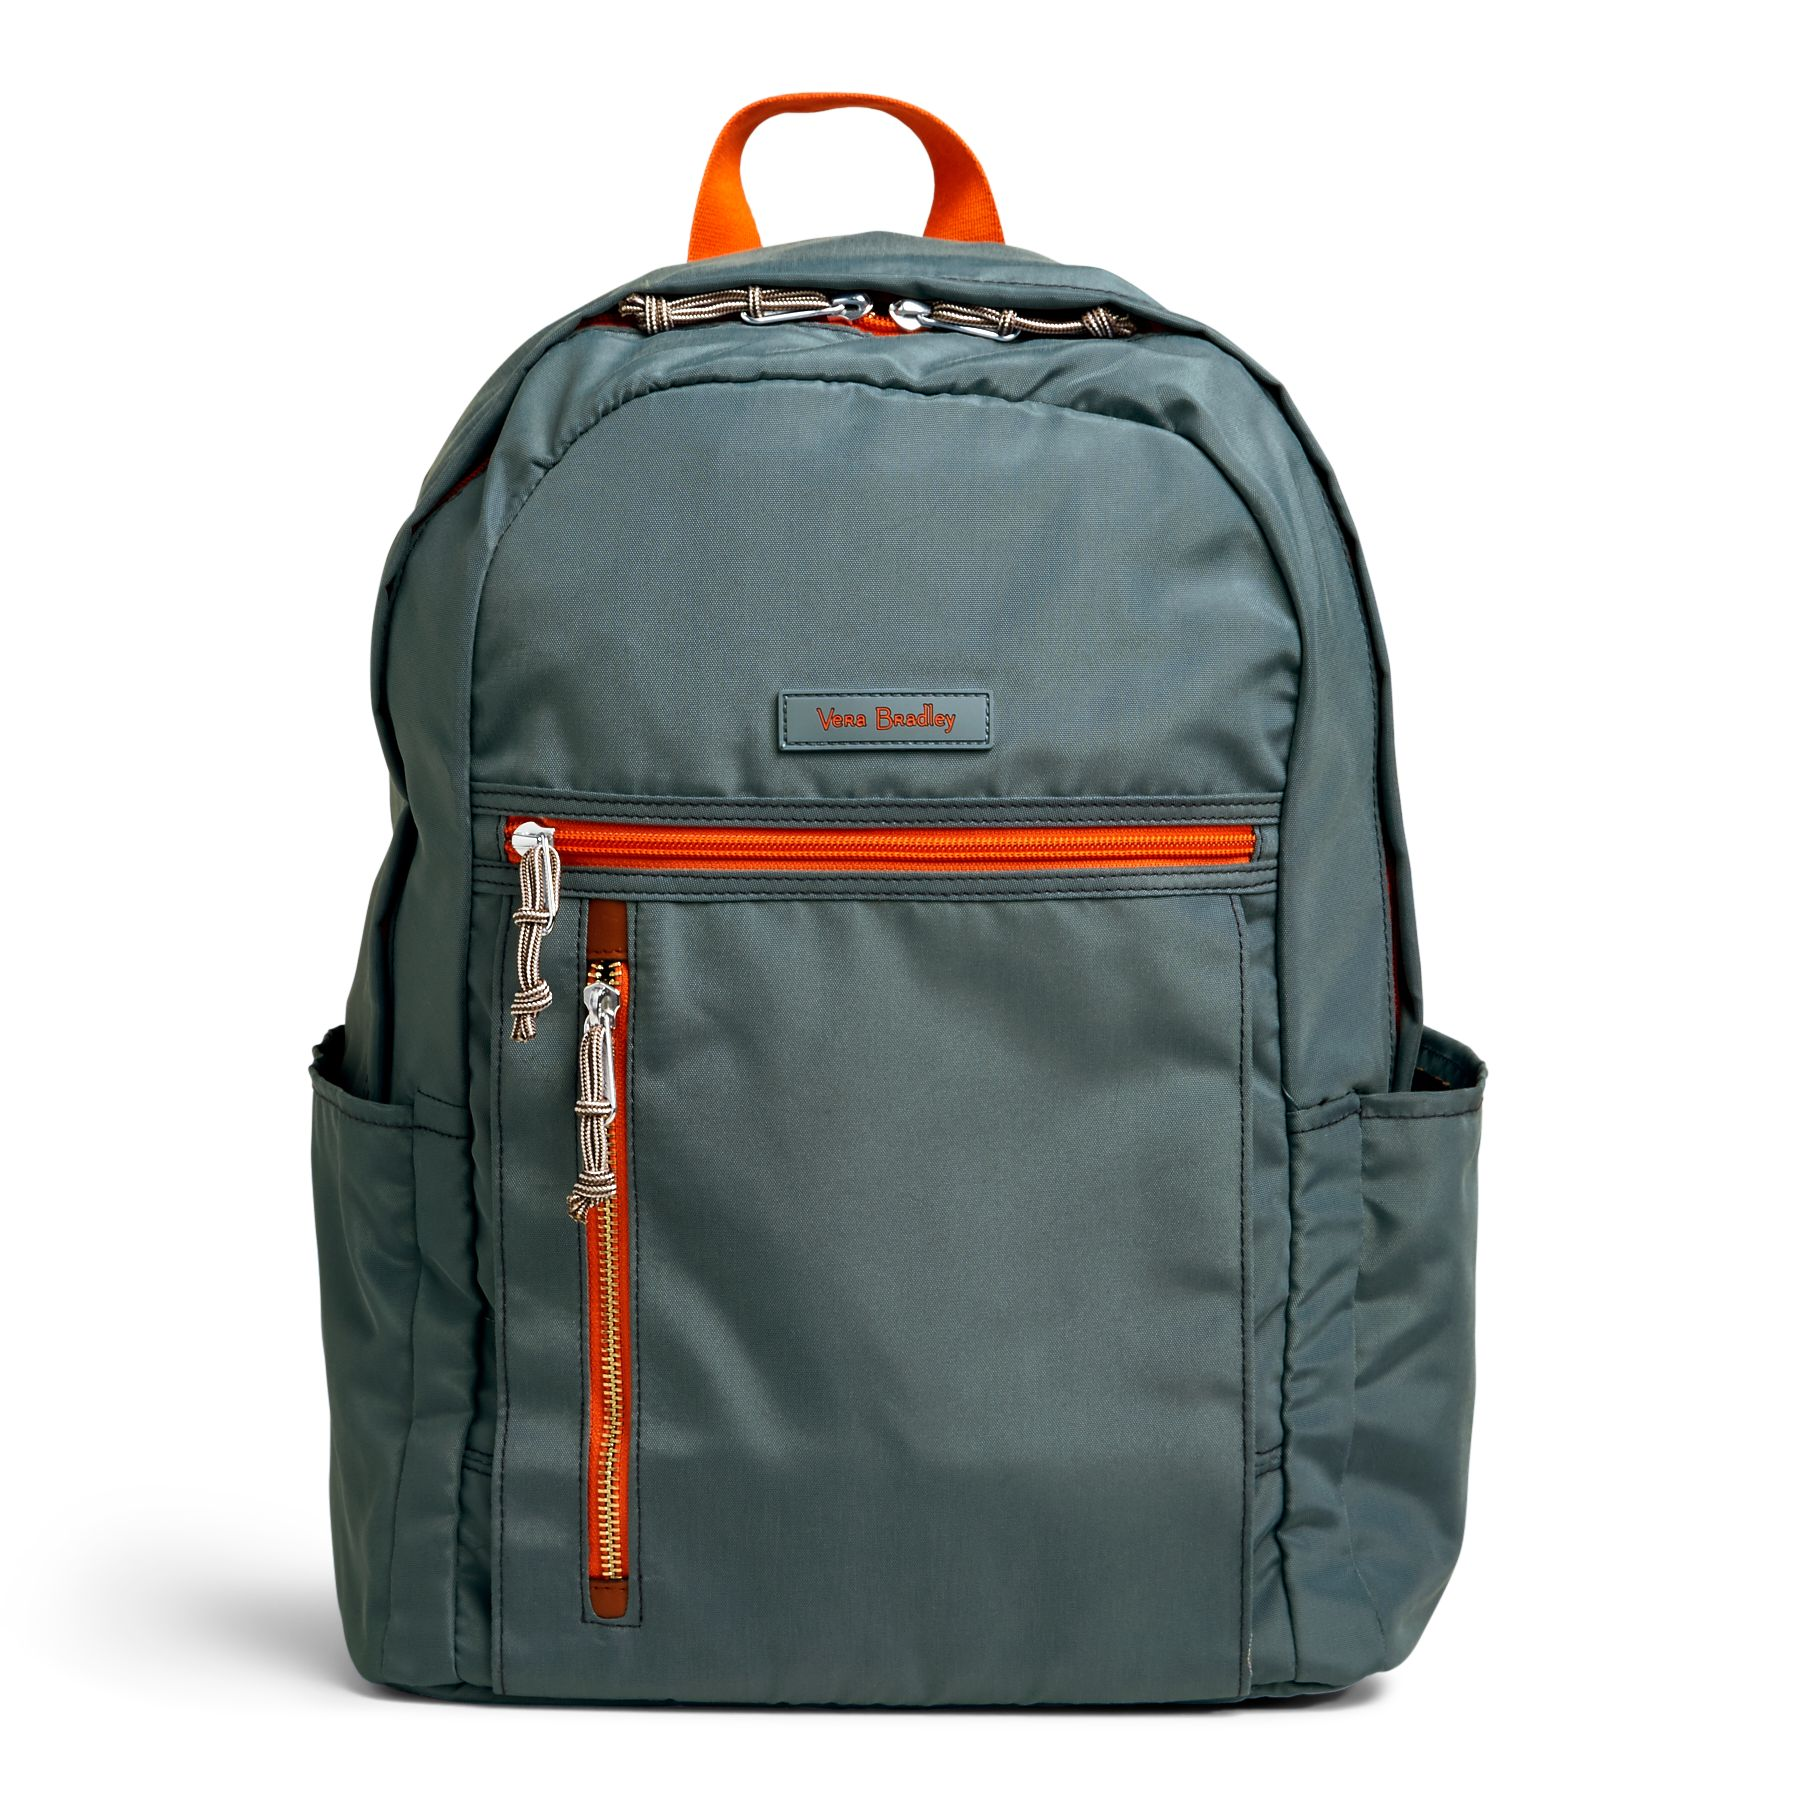 1aaaa24dcd Vera Bradley Lighten Up Small Backpack